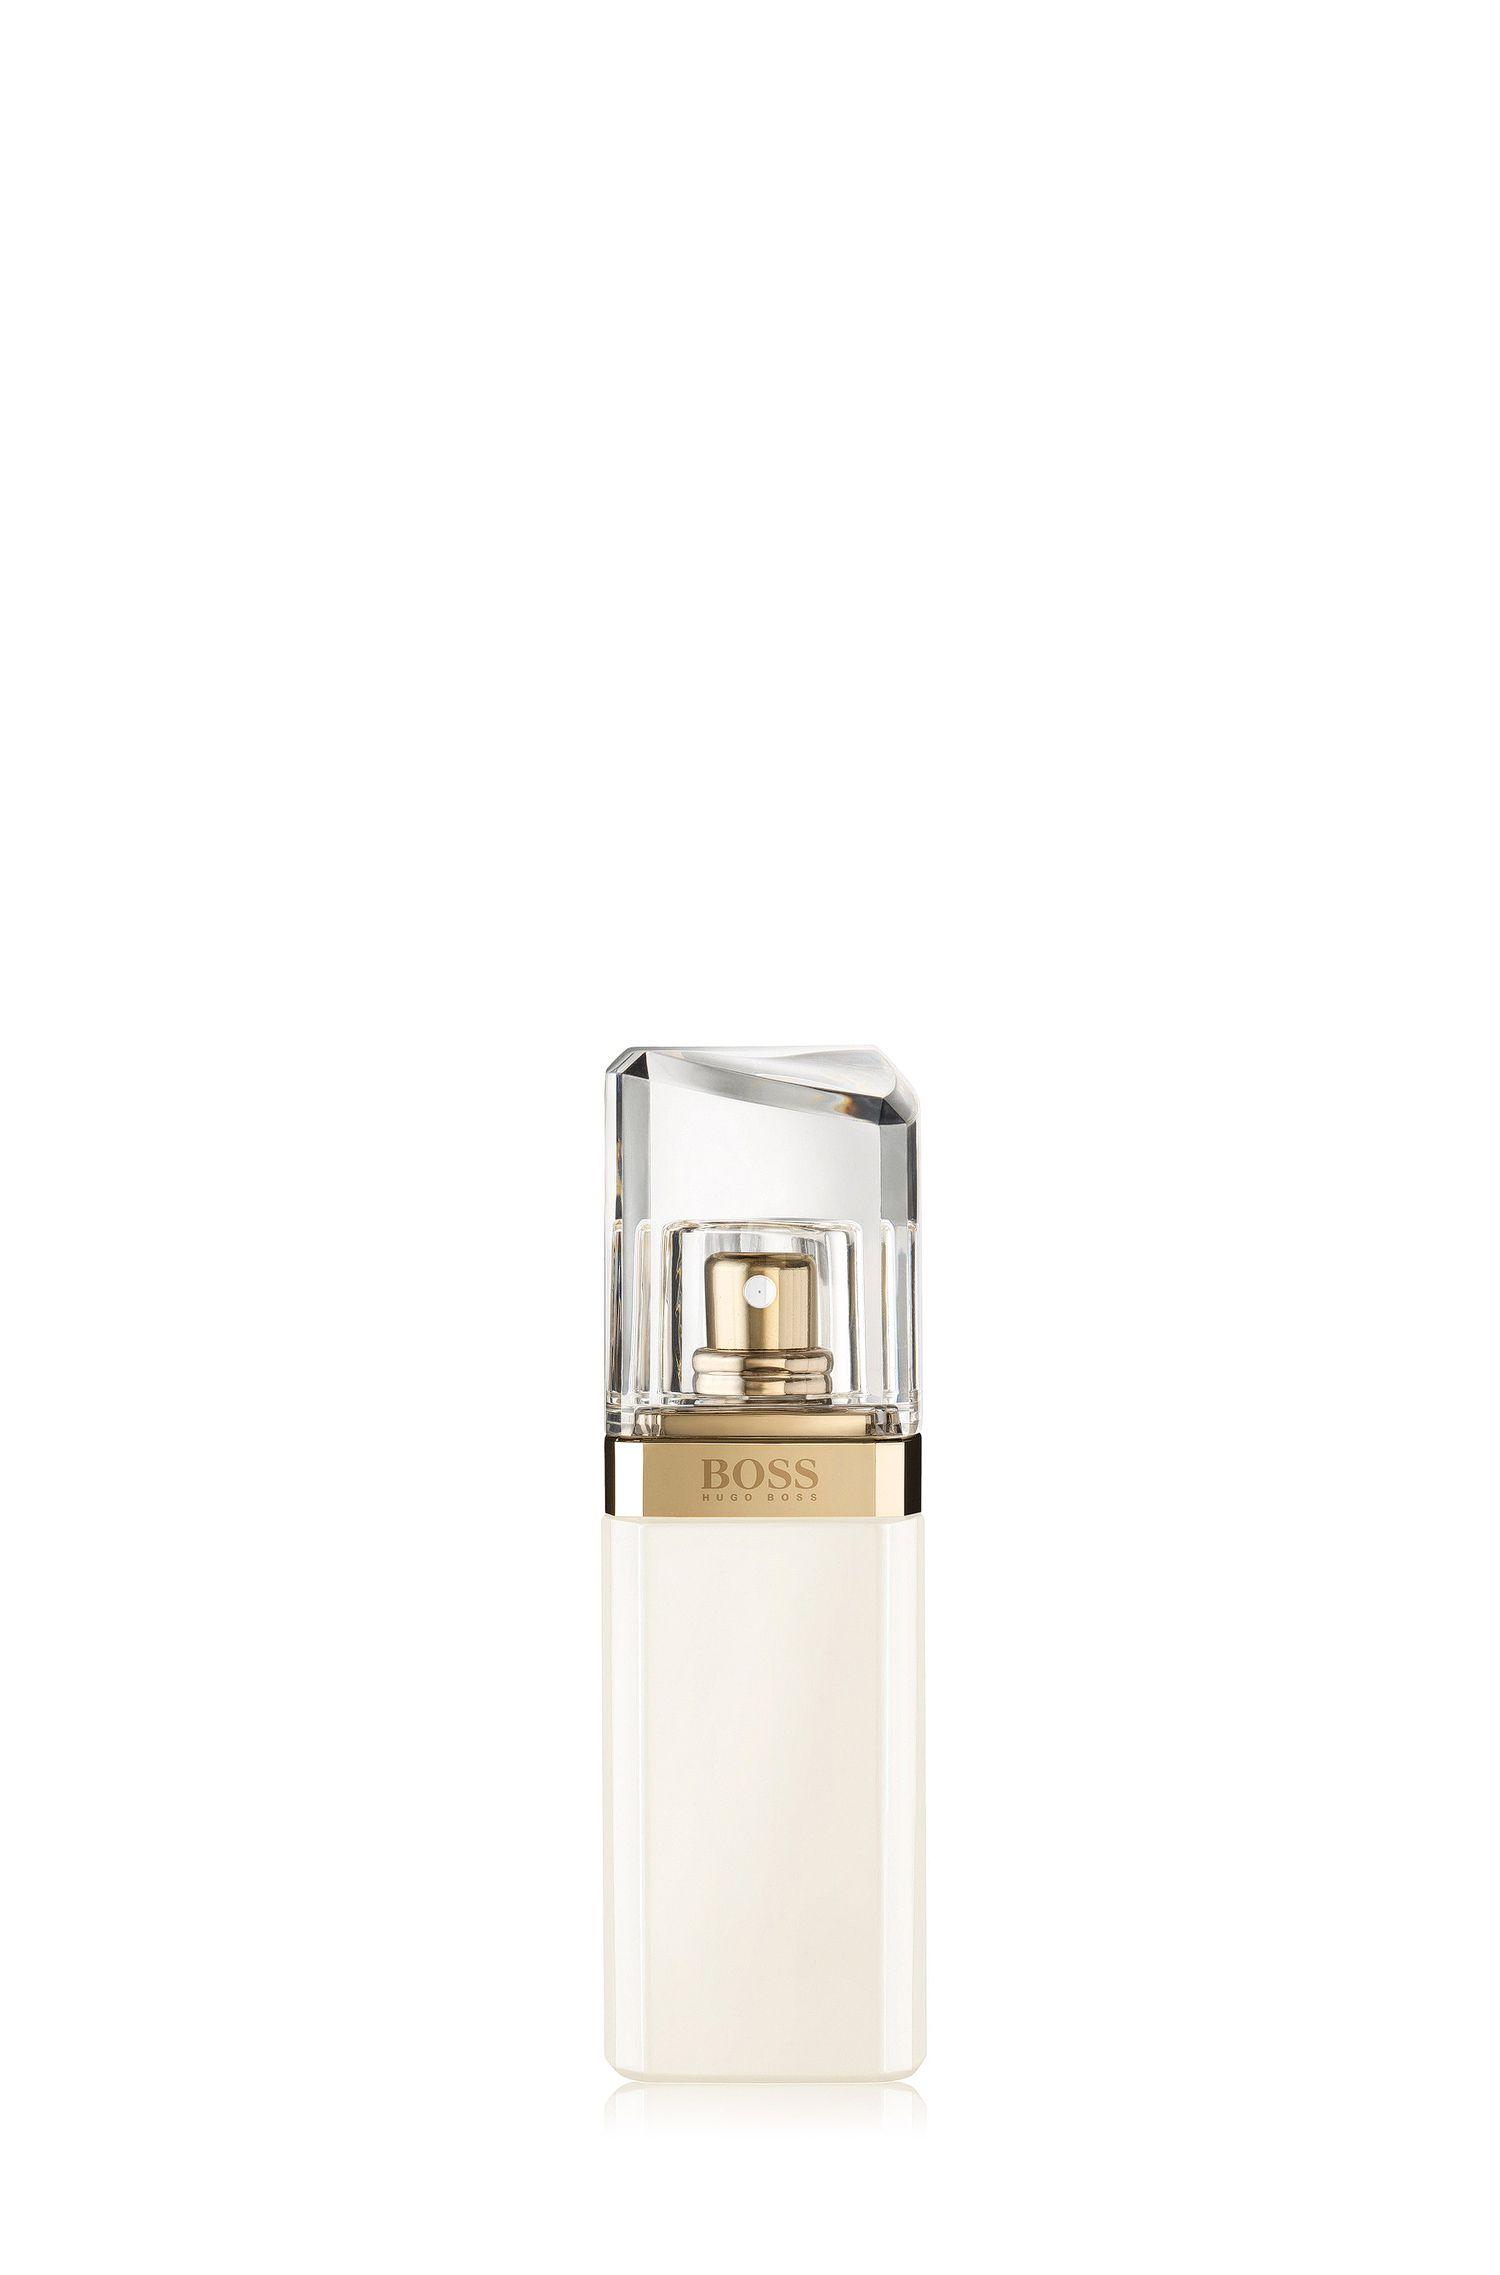 Eau de parfum BOSS Jour 30ml, Assorted-Pre-Pack